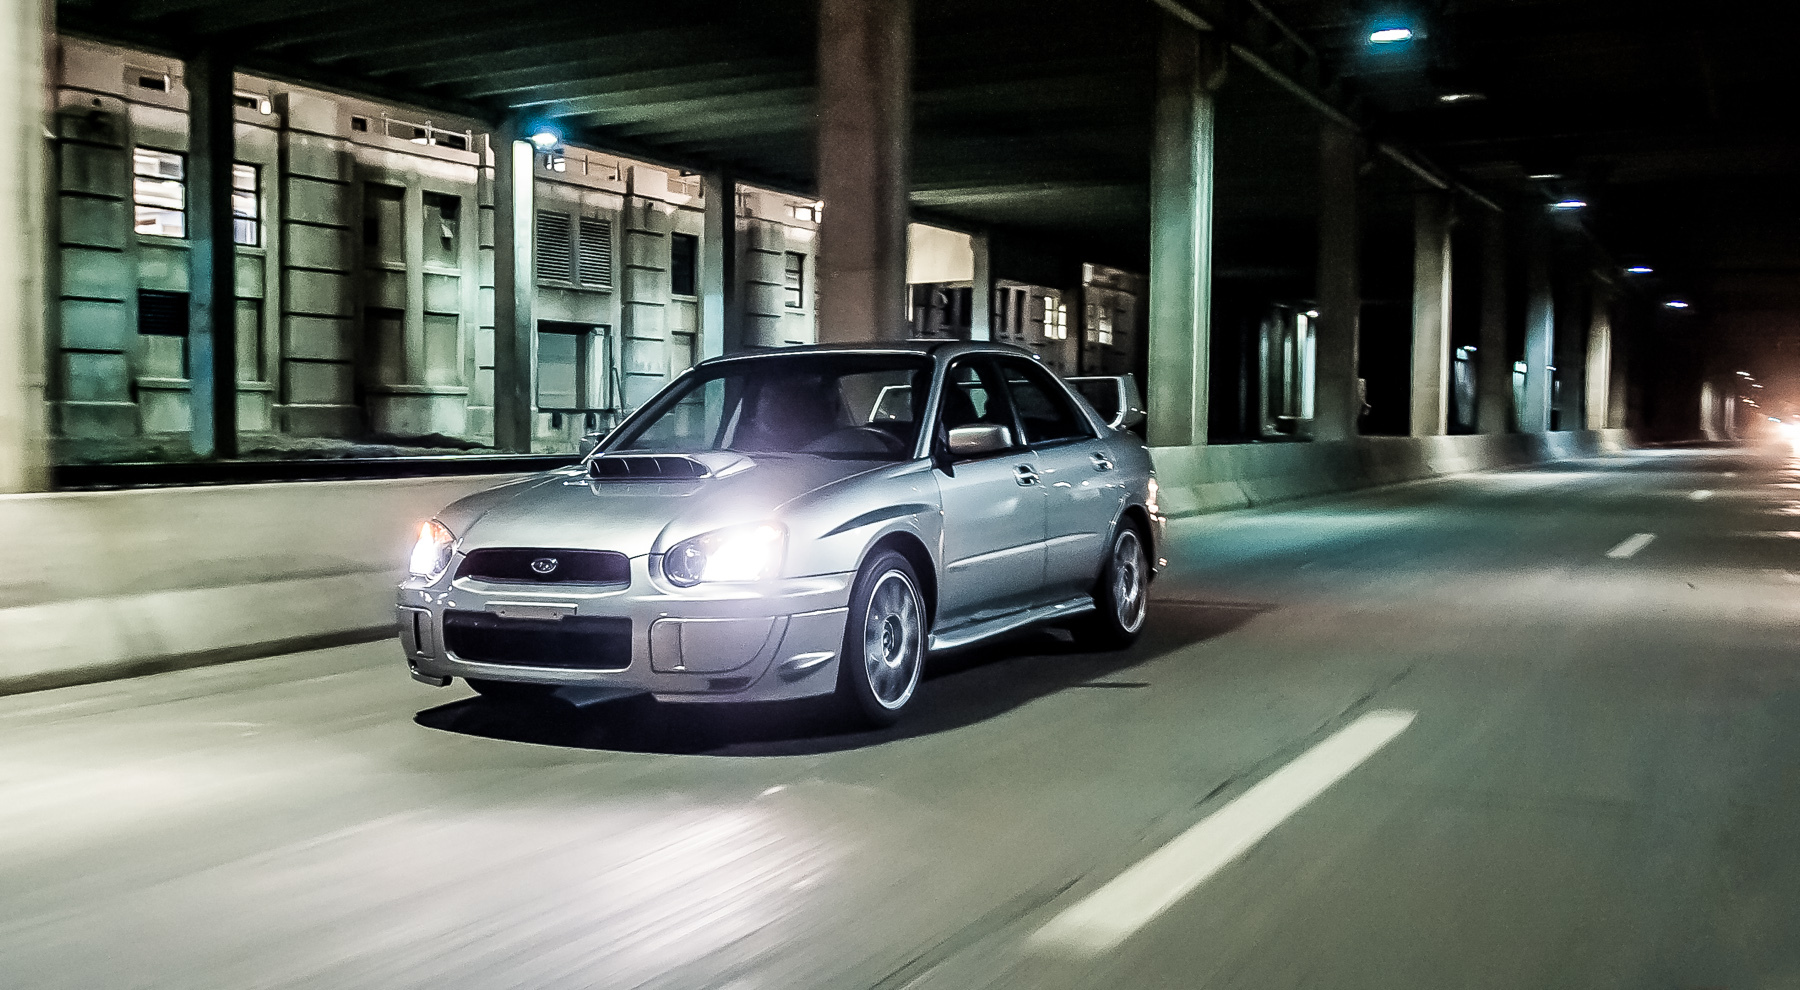 2005 Subaru Impreza WRX STi